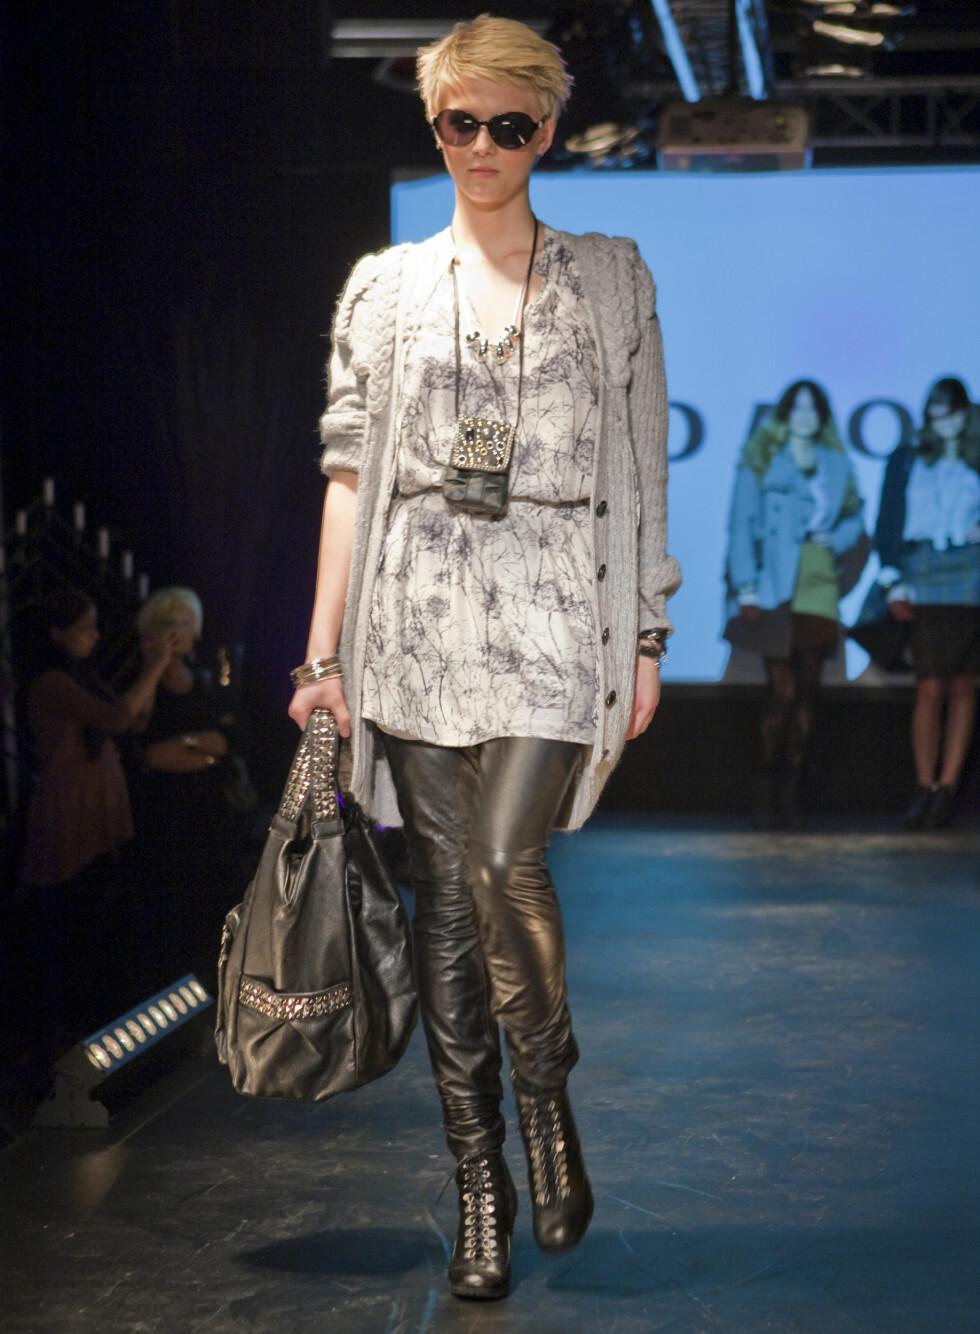 Svarte, rocka skinntights kan fint brukes sammen med myke detaljer som en mønstret tunika og en strikket cardigan.  Foto: Per Ervland